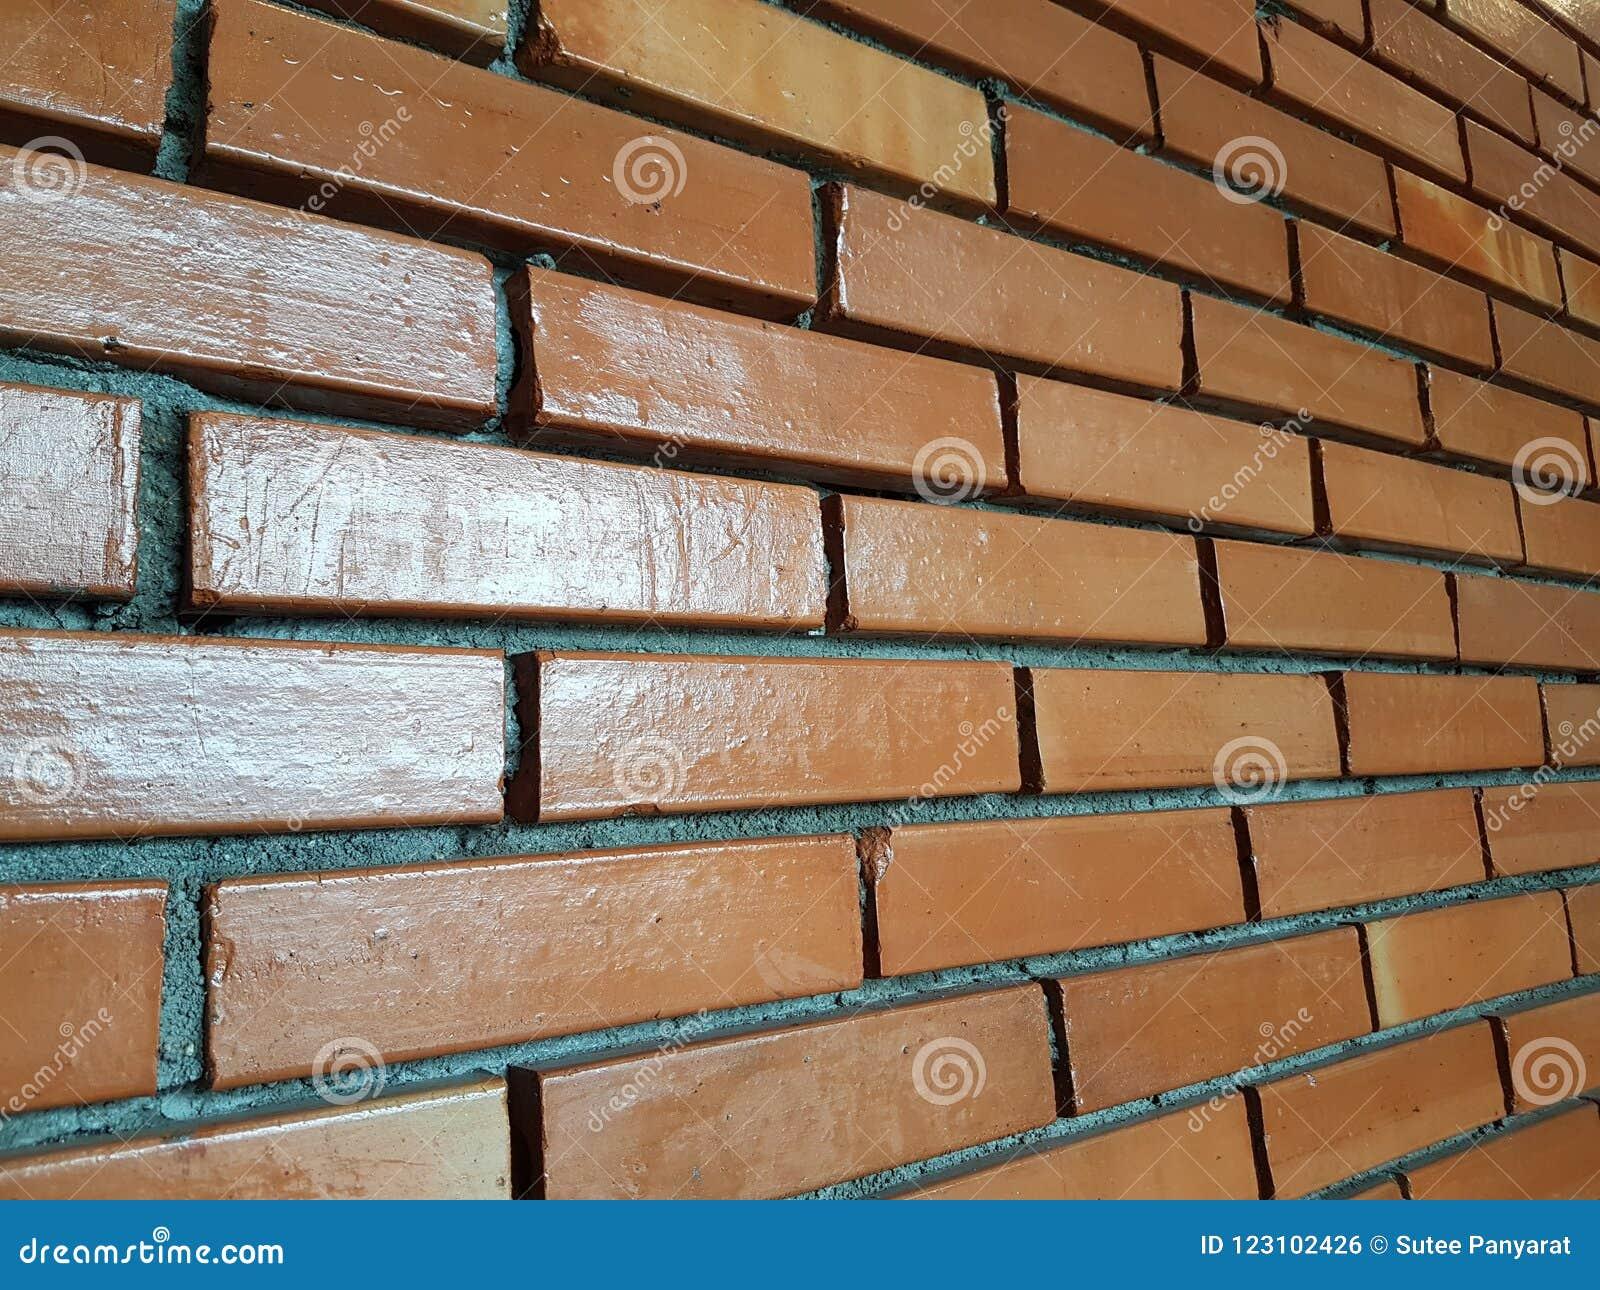 Modularna Cegla Zdjecie Stock Obraz Zlozonej Z Brickwork 123102426